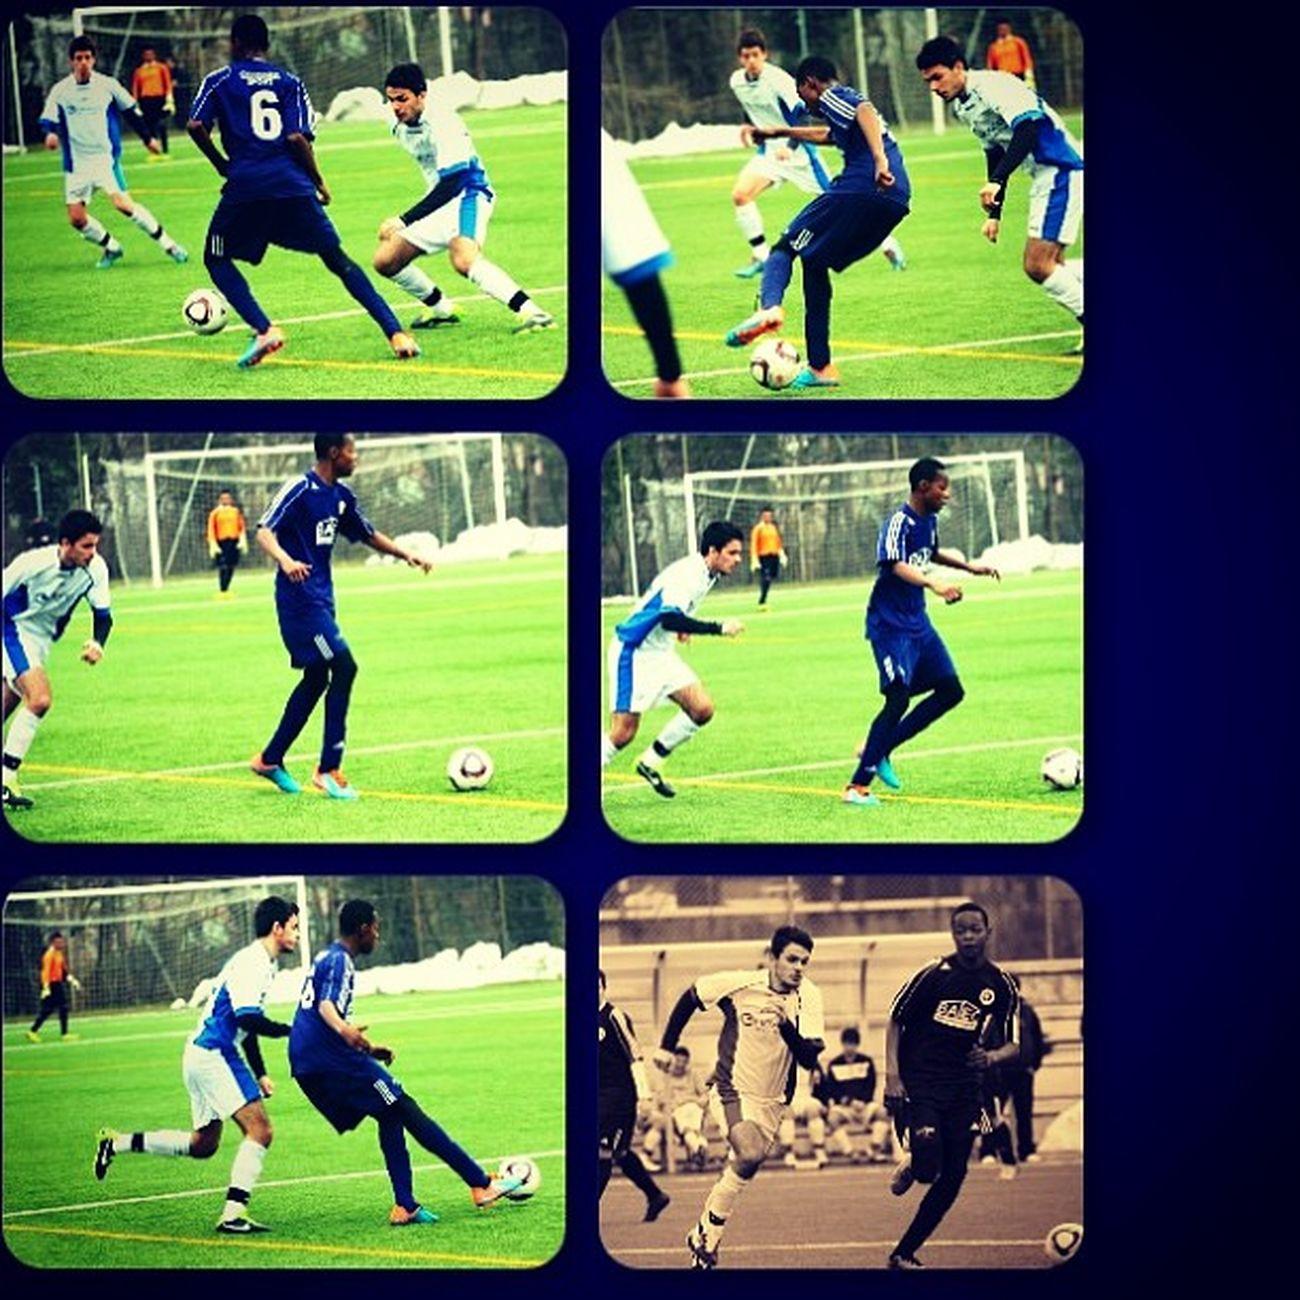 Football EtoileCarouge 6 8 Soccer Skills  Chelseafc Champions